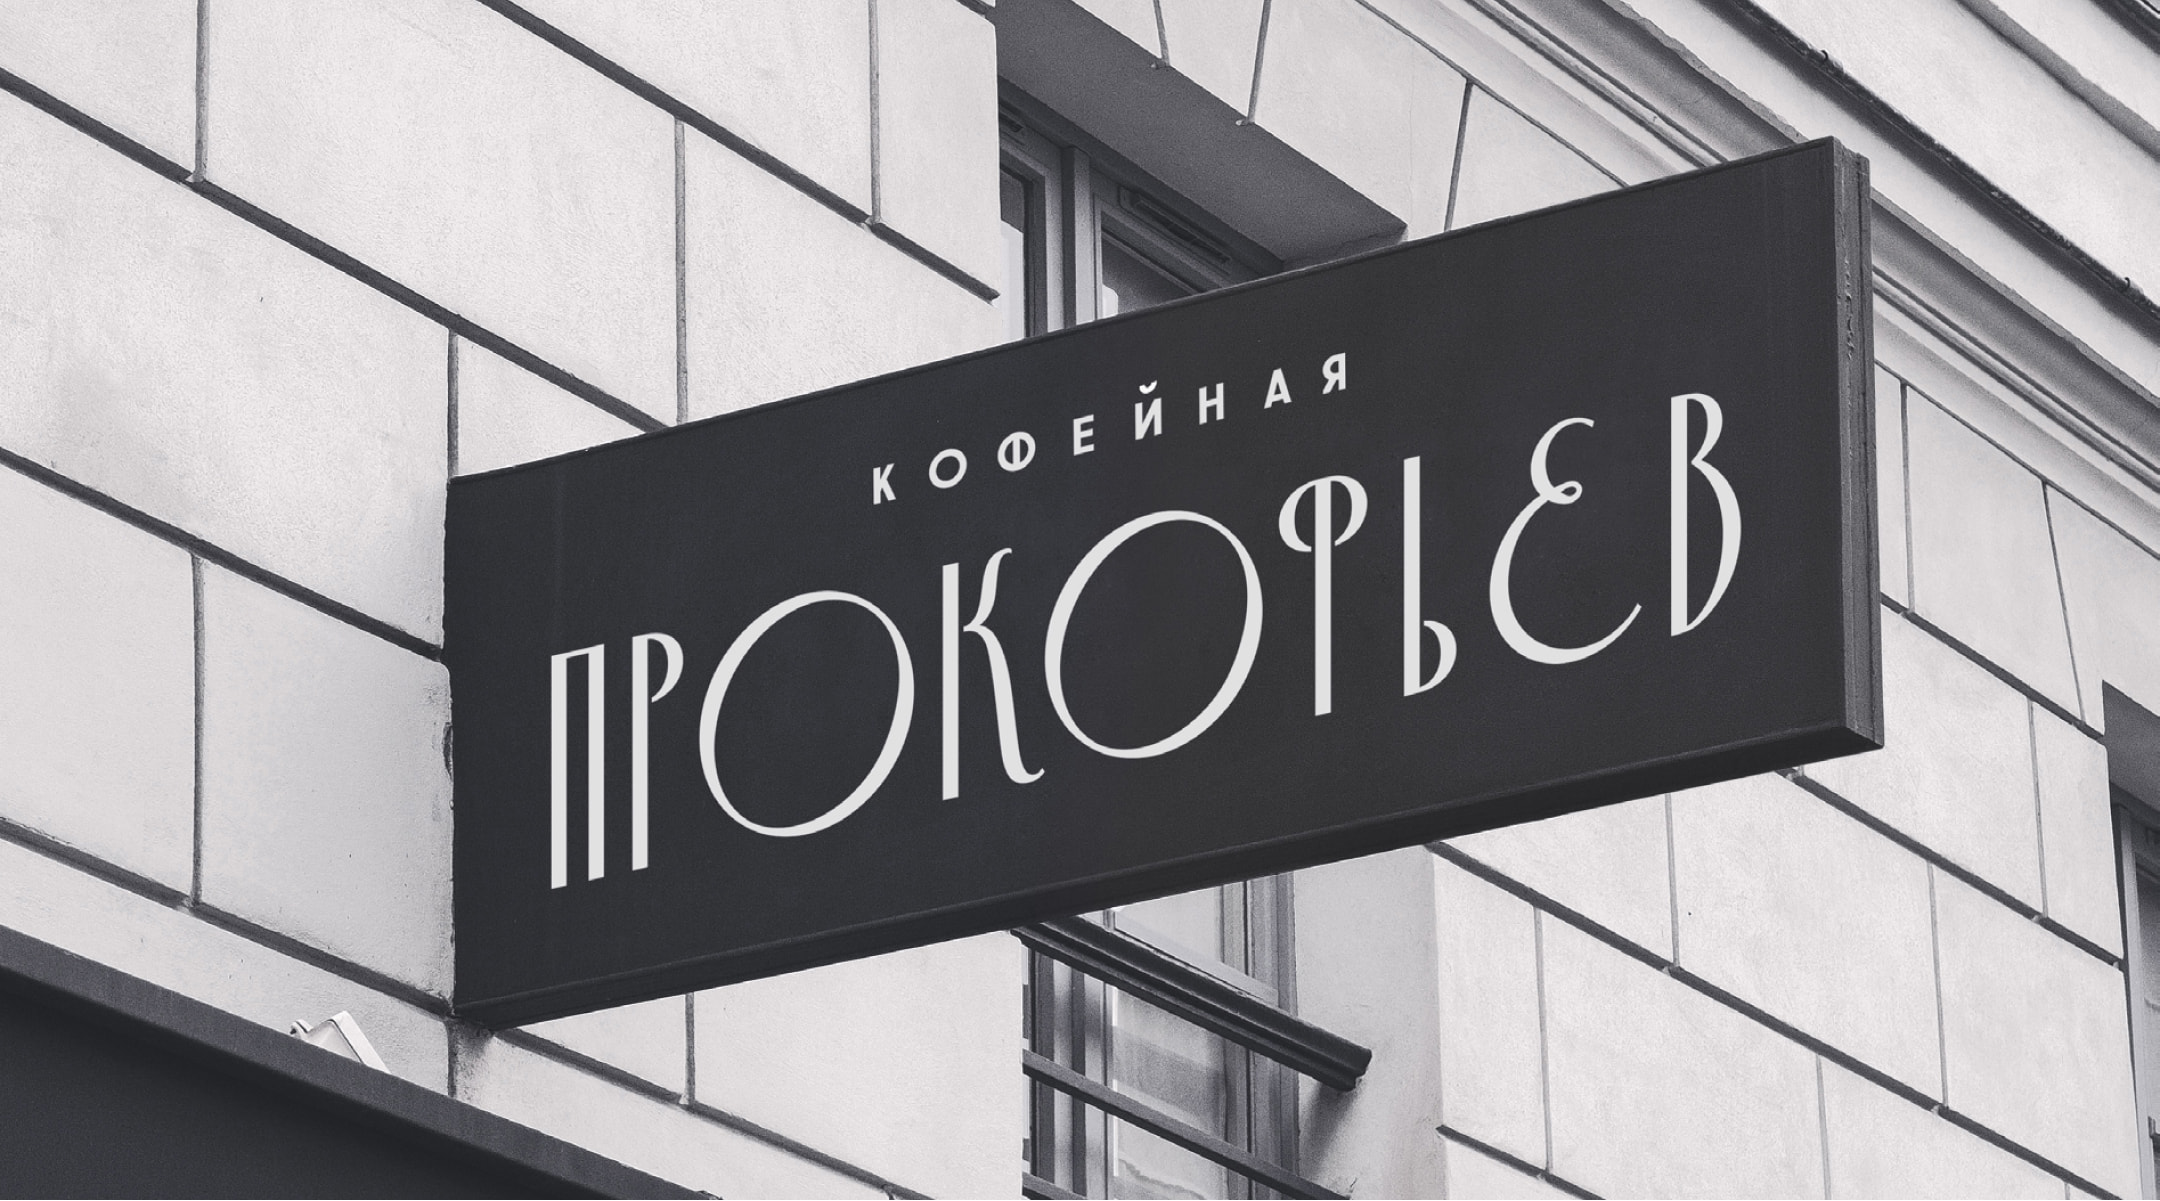 prokofiev_01-2